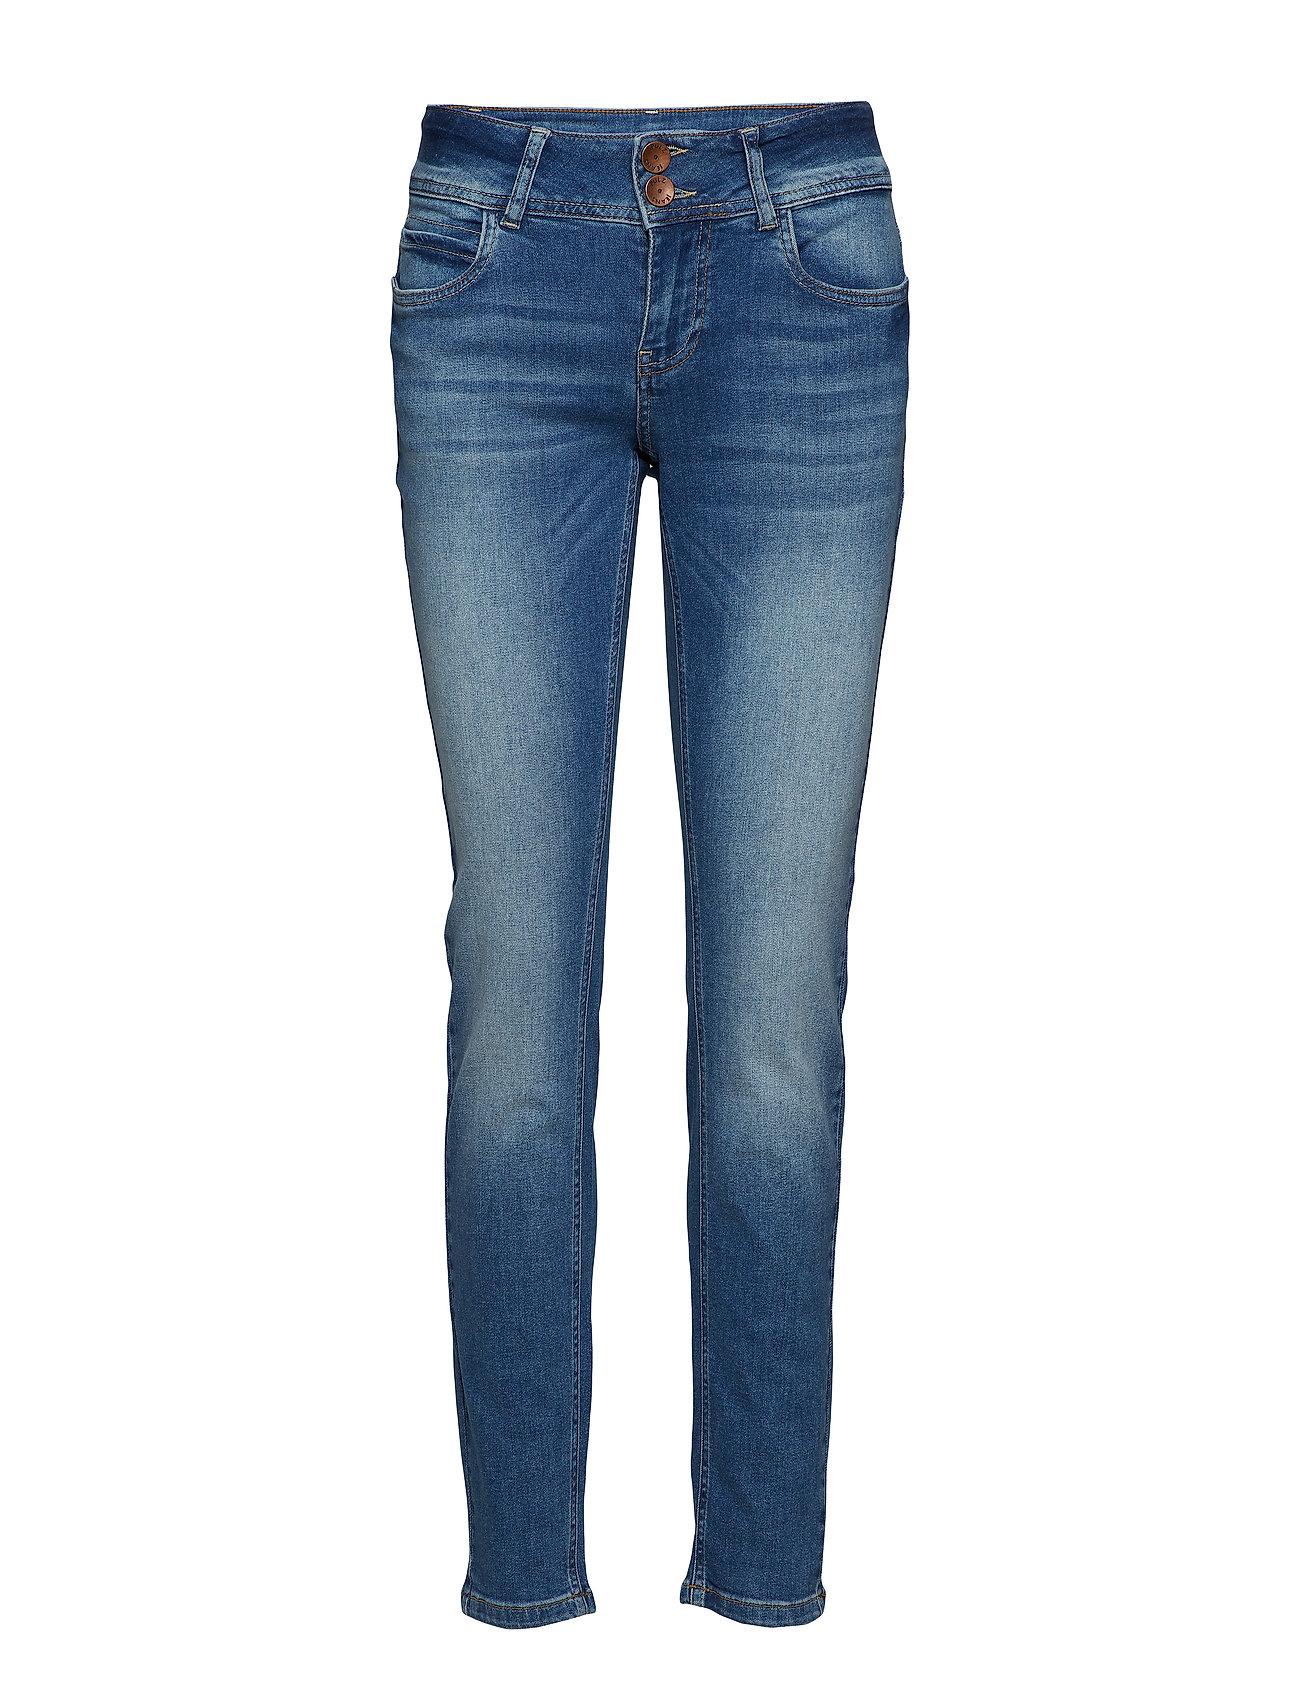 Pulz Jeans Haya Curve Skinny Jeans